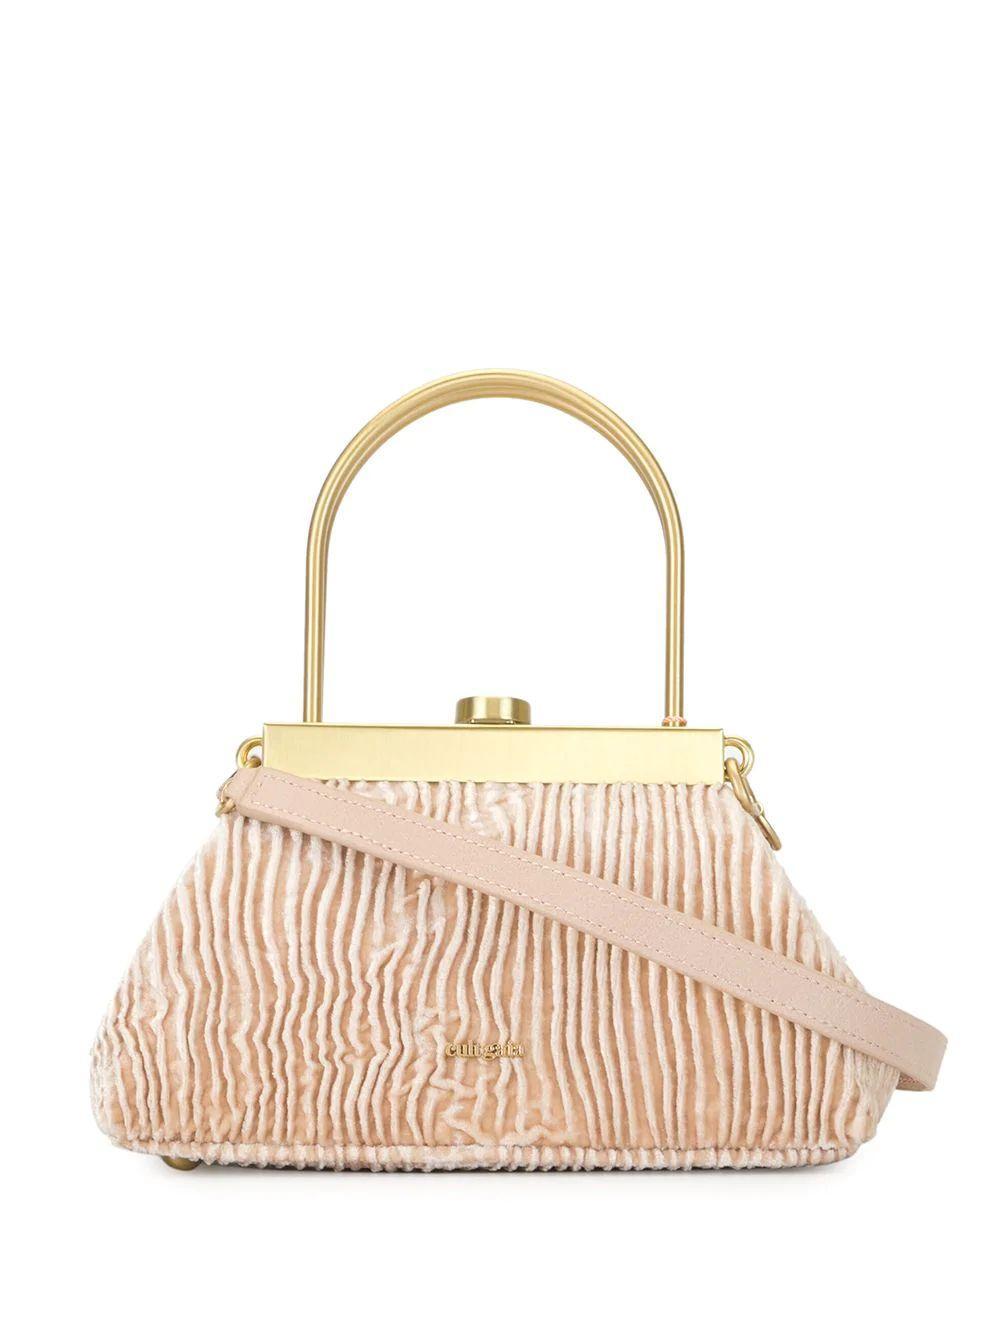 Estelle Mini Bag Crossbody Item # CB1145VT